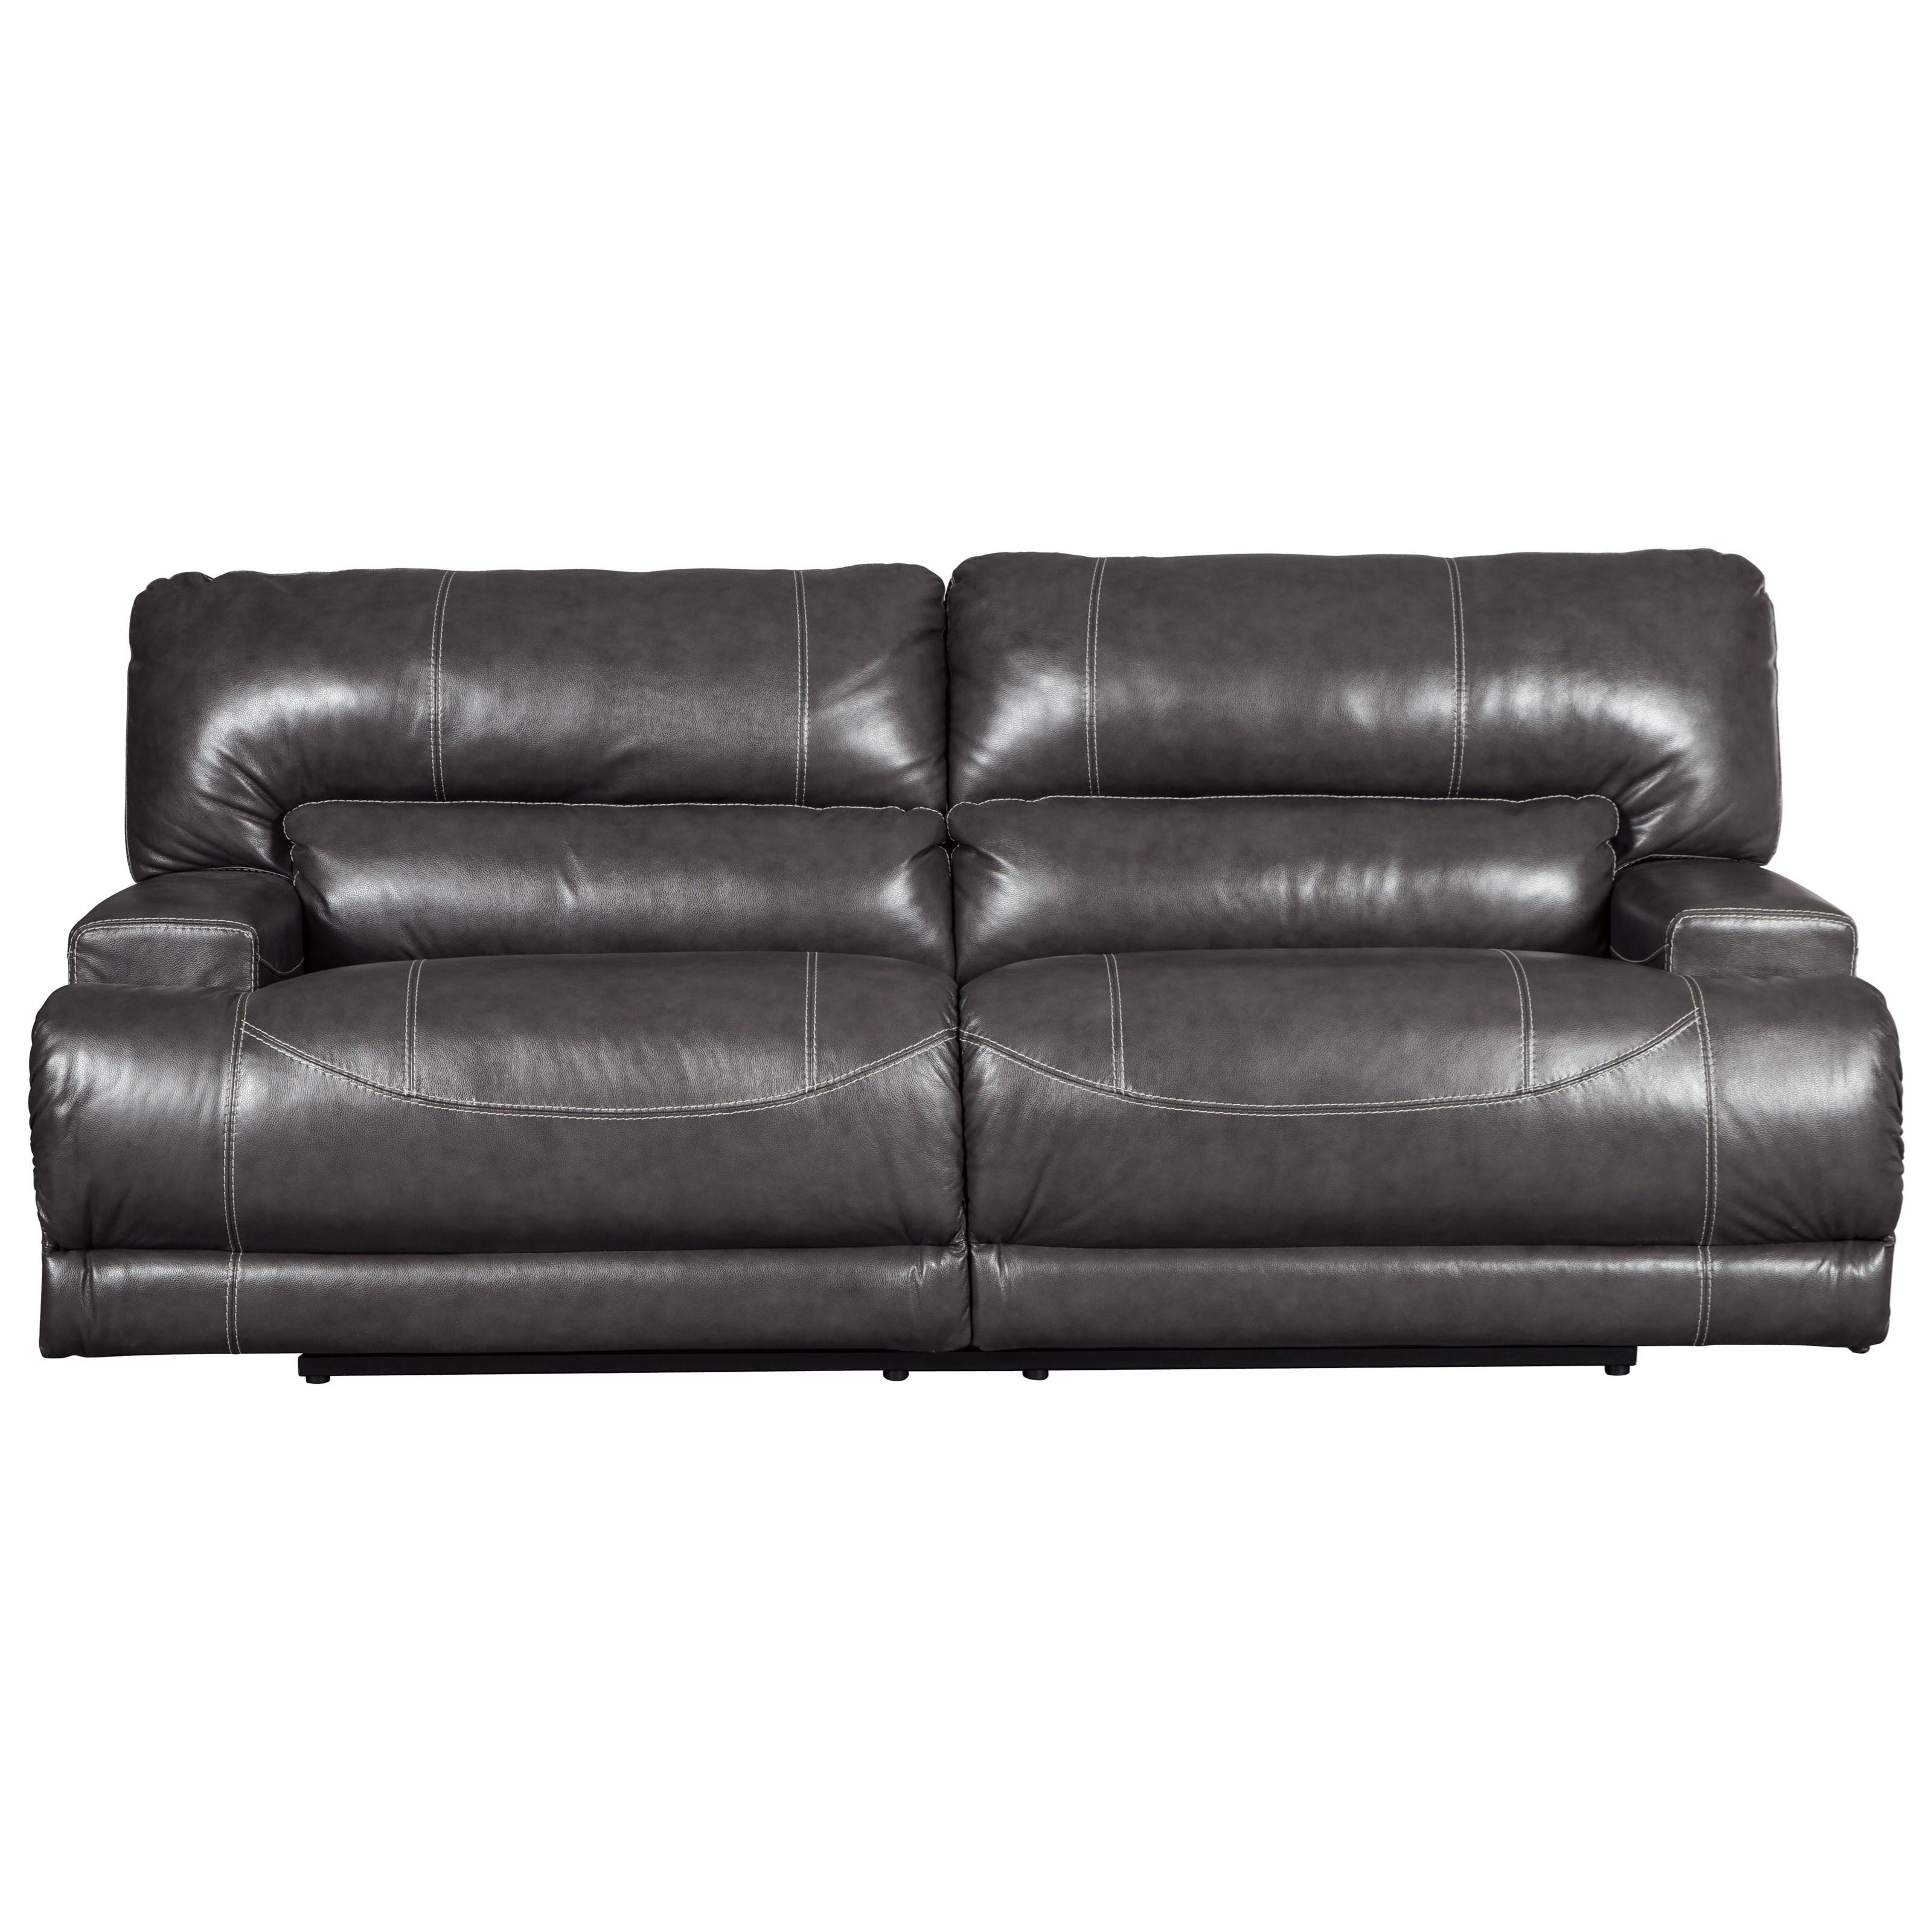 Signature Design By Ashley McCaskill2 Seat Reclining Sofa ...